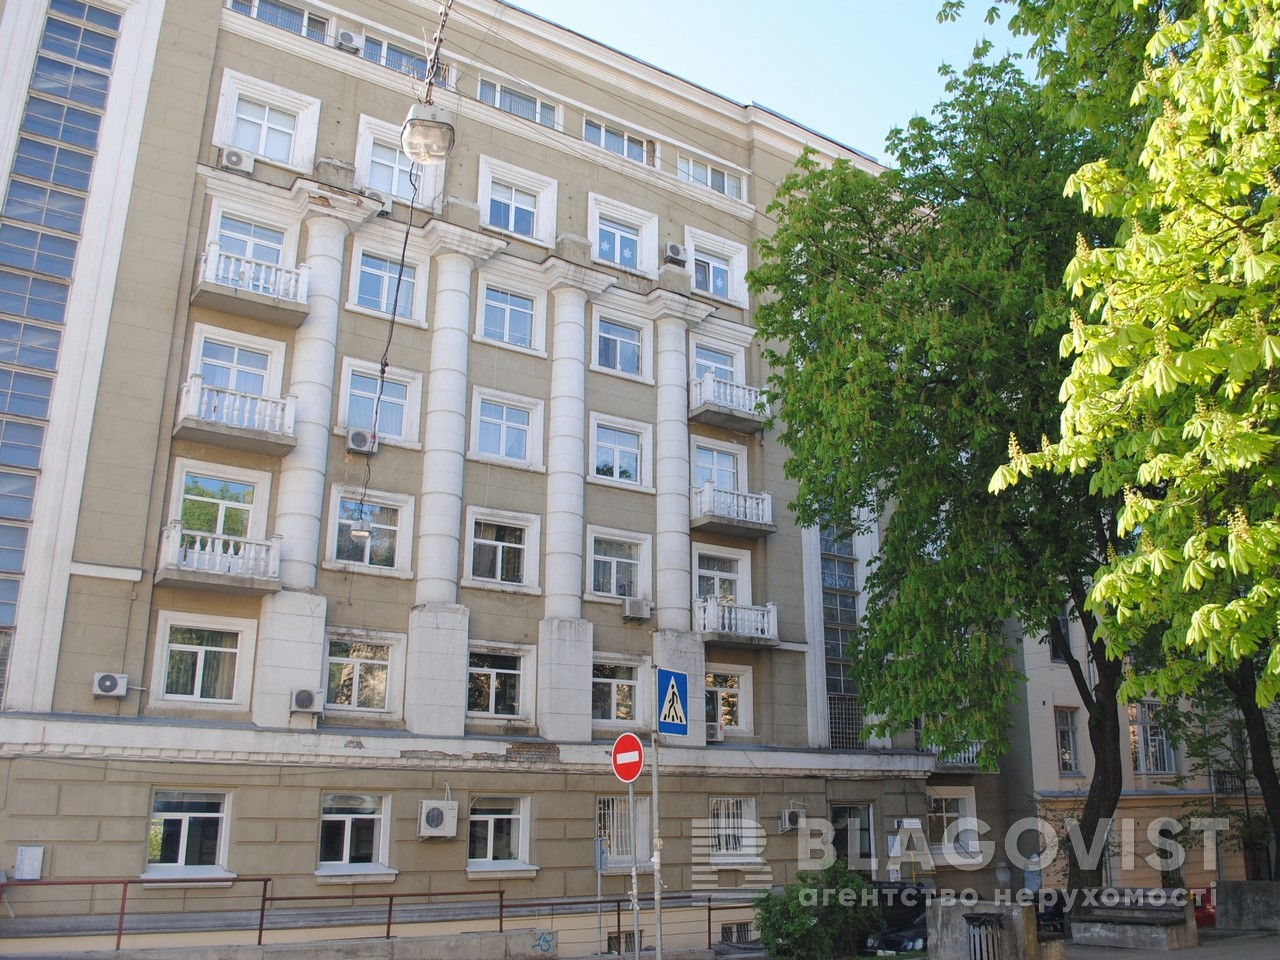 Квартира A-69426, Костельная, 10, Киев - Фото 2